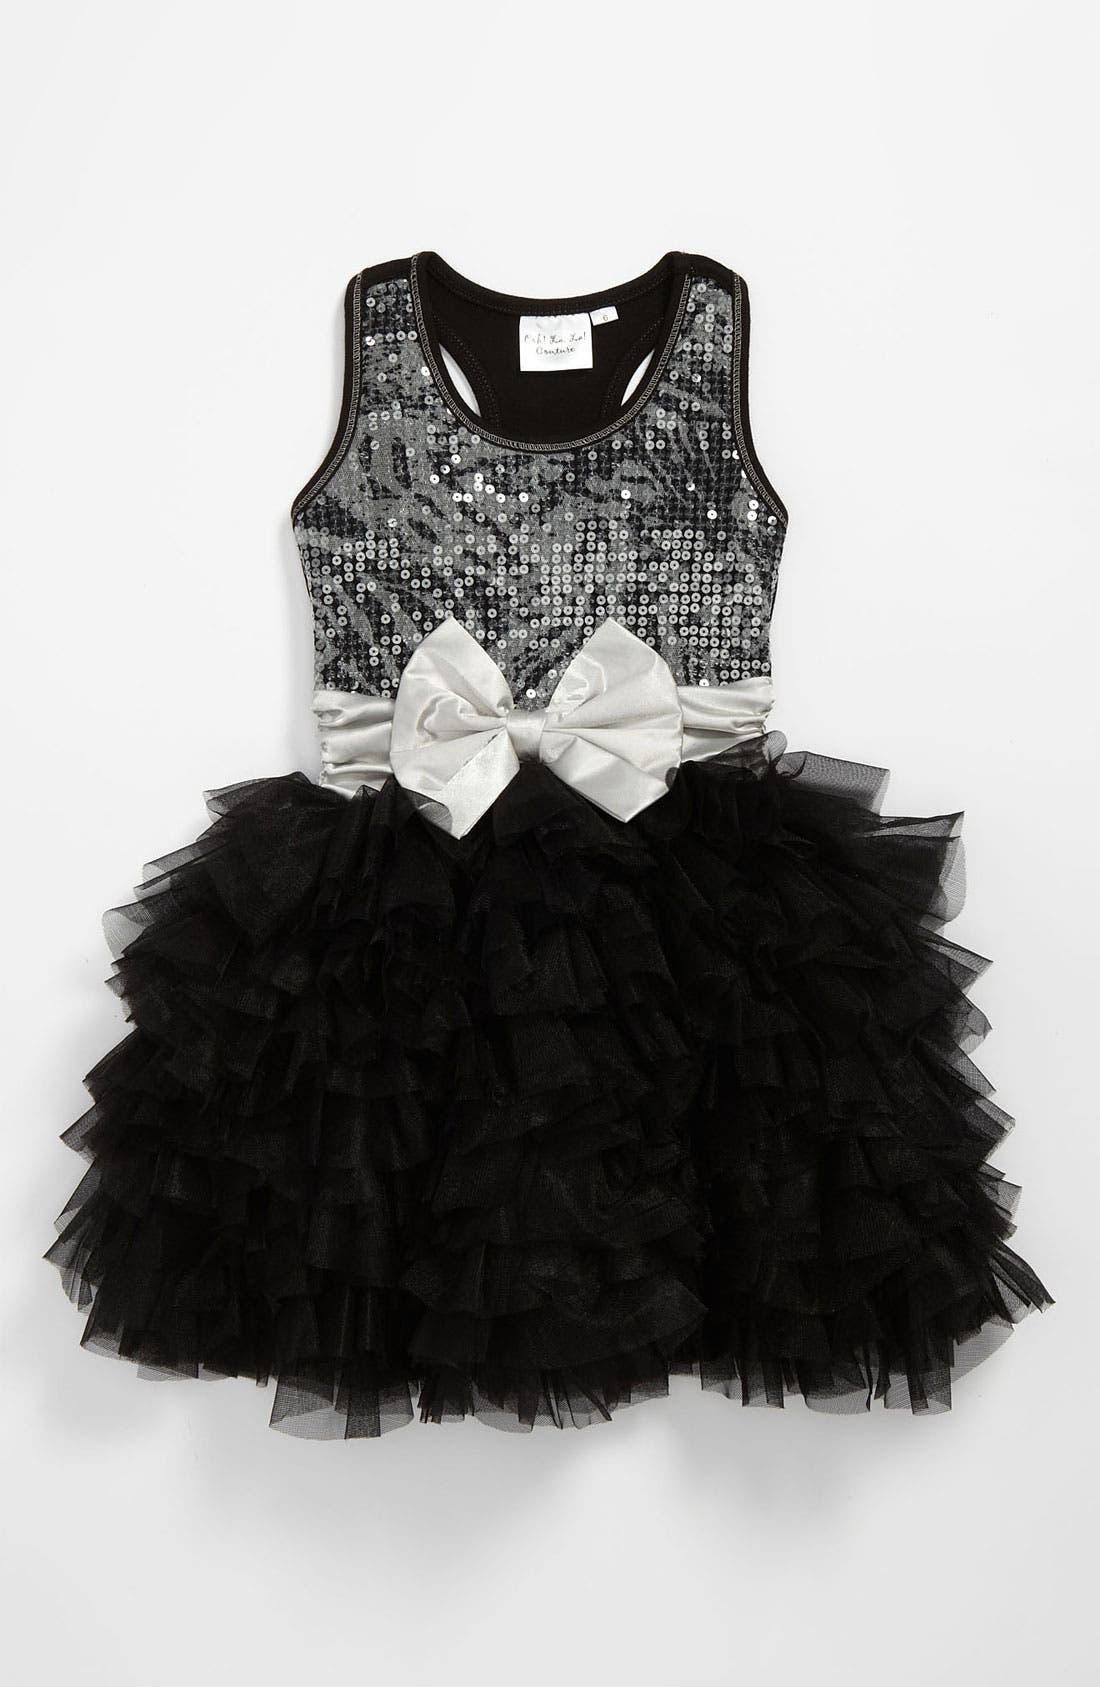 Main Image - Ooh! La, La! Couture 'Wow Dream' Dress (Little Girls & Big Girls)